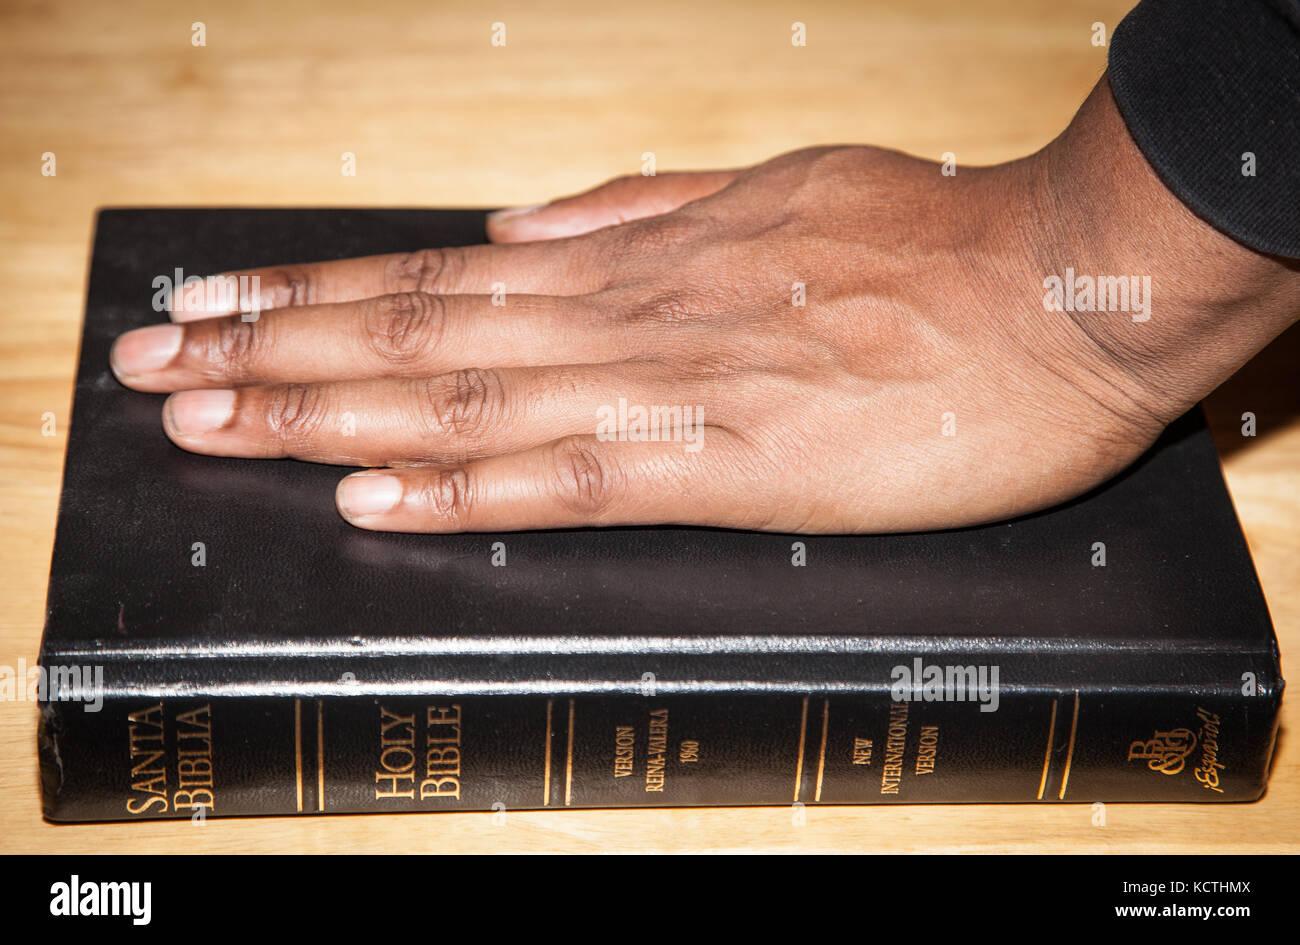 Testimony Stock Photos & Testimony Stock Images - Alamy